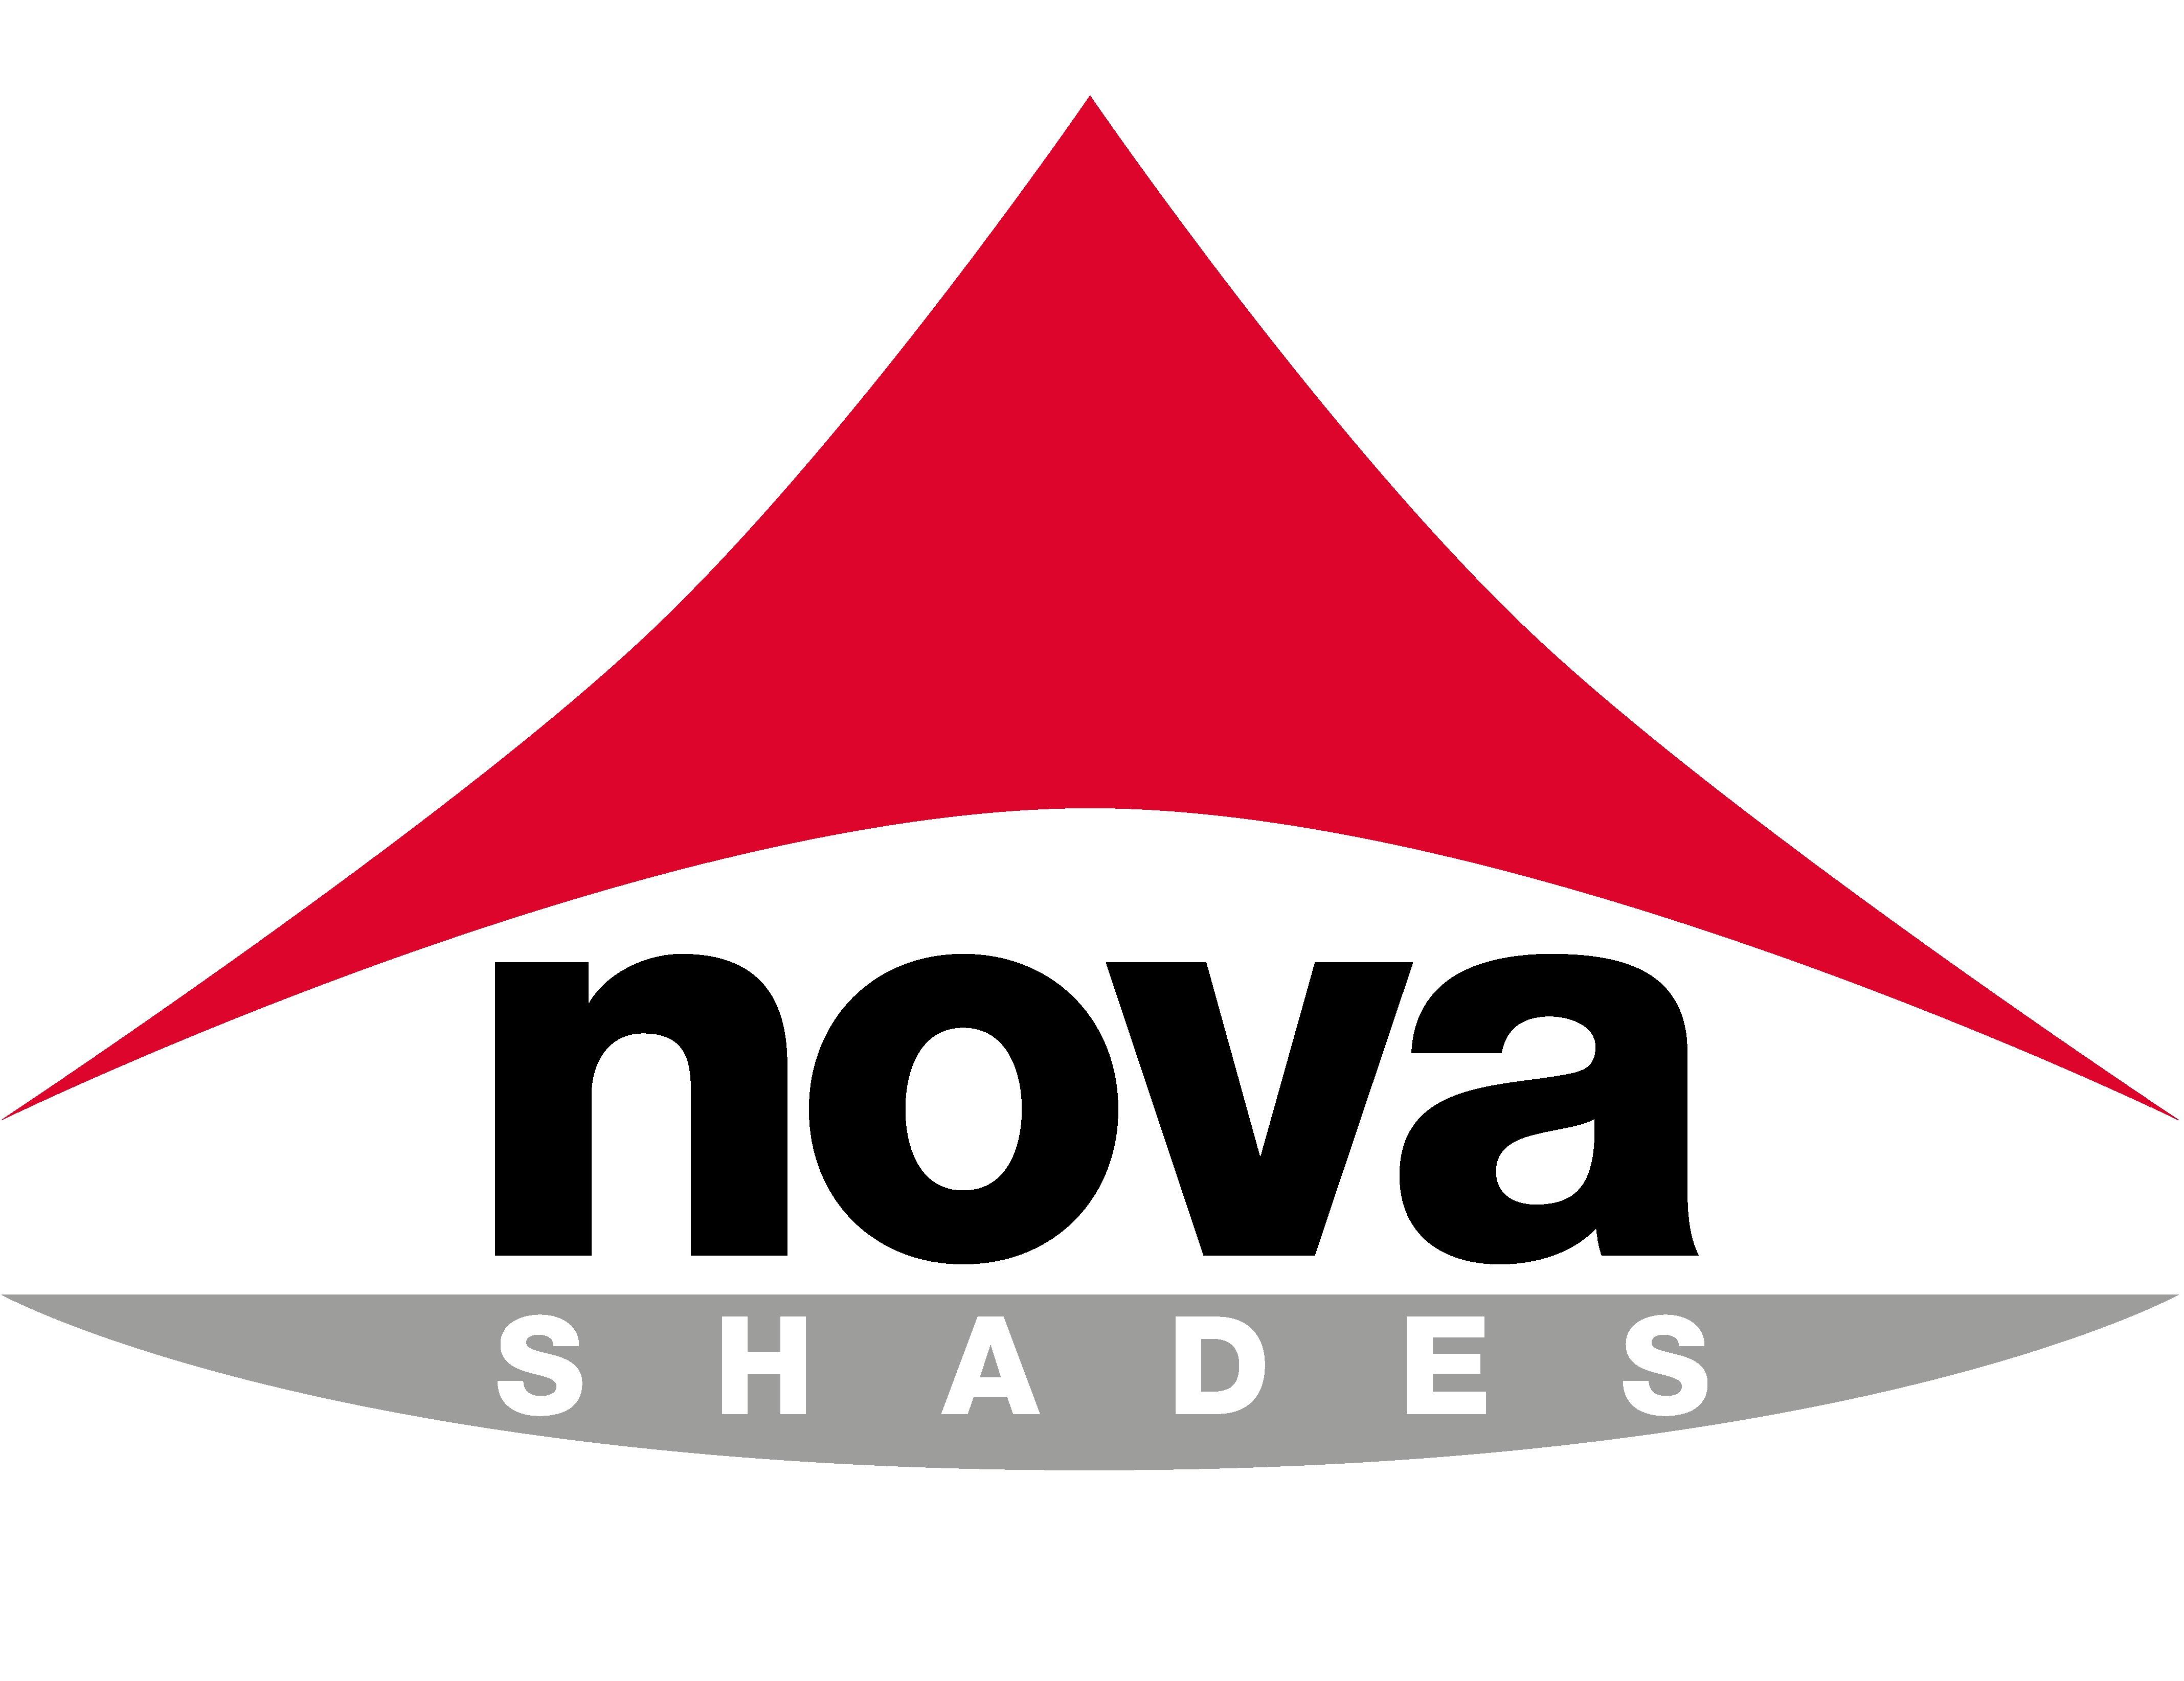 Nova Shades Ltd